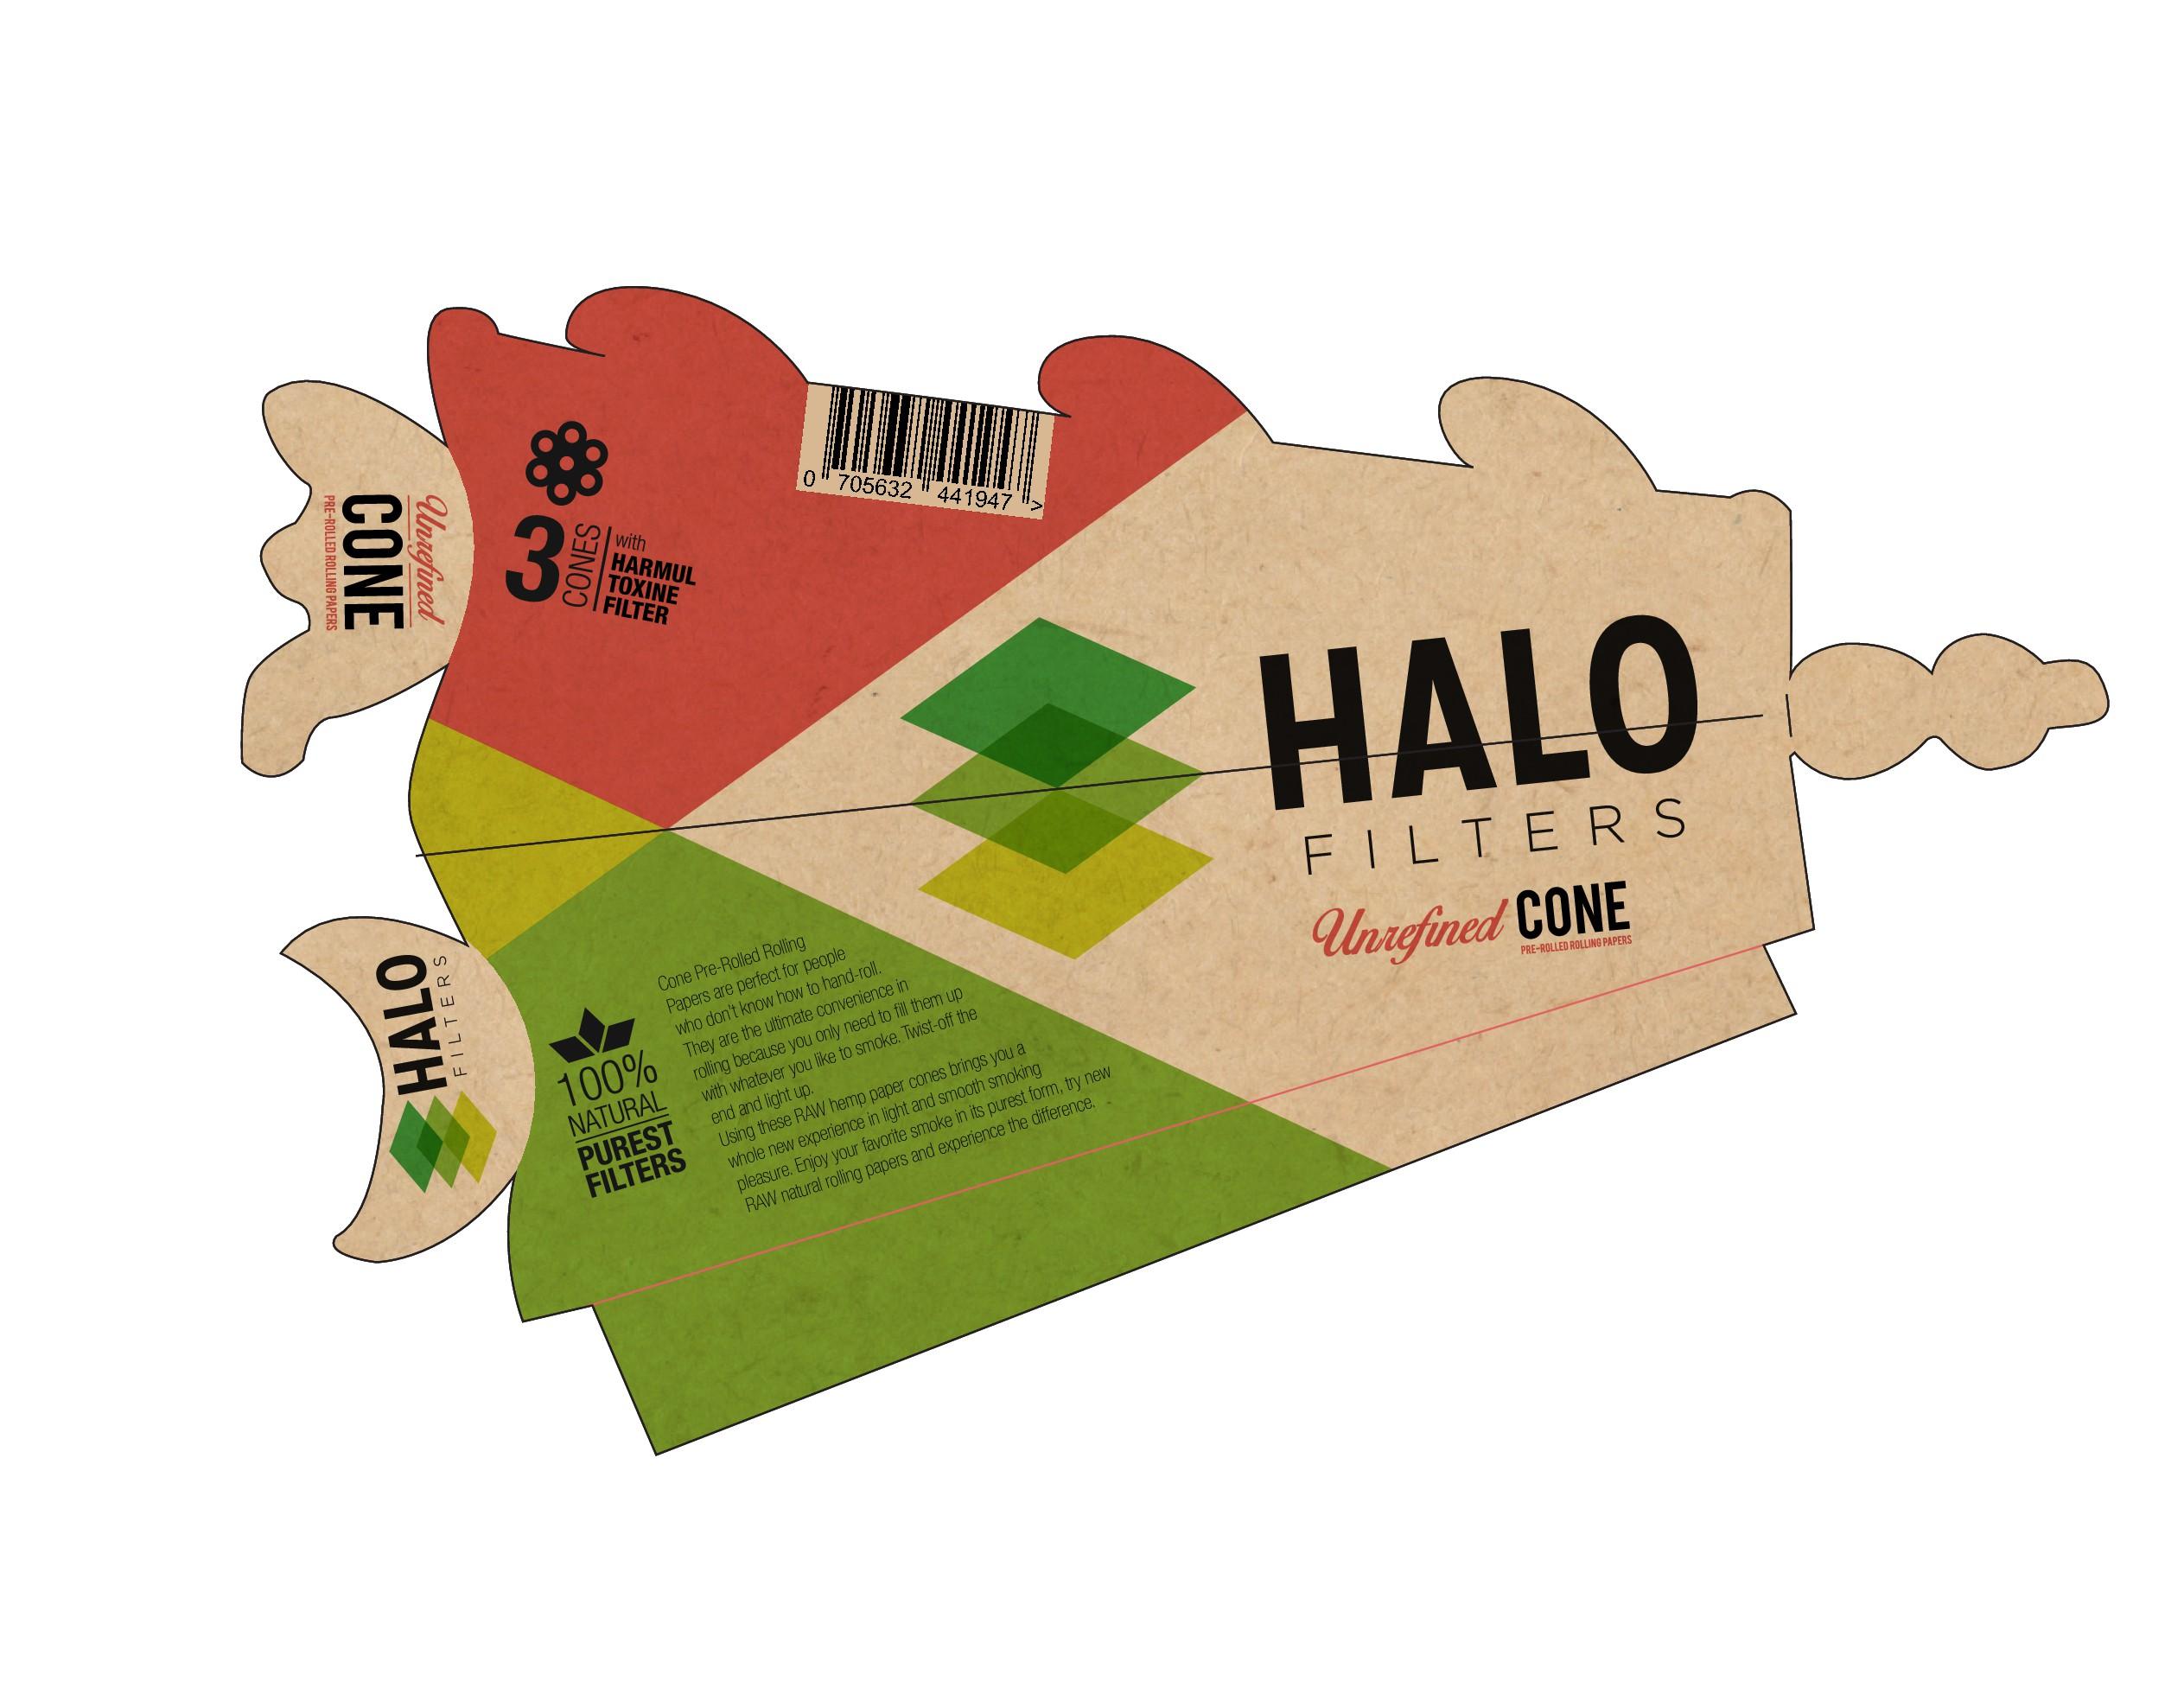 New Smoking Filter Brand Needs Innovative Packaging Design